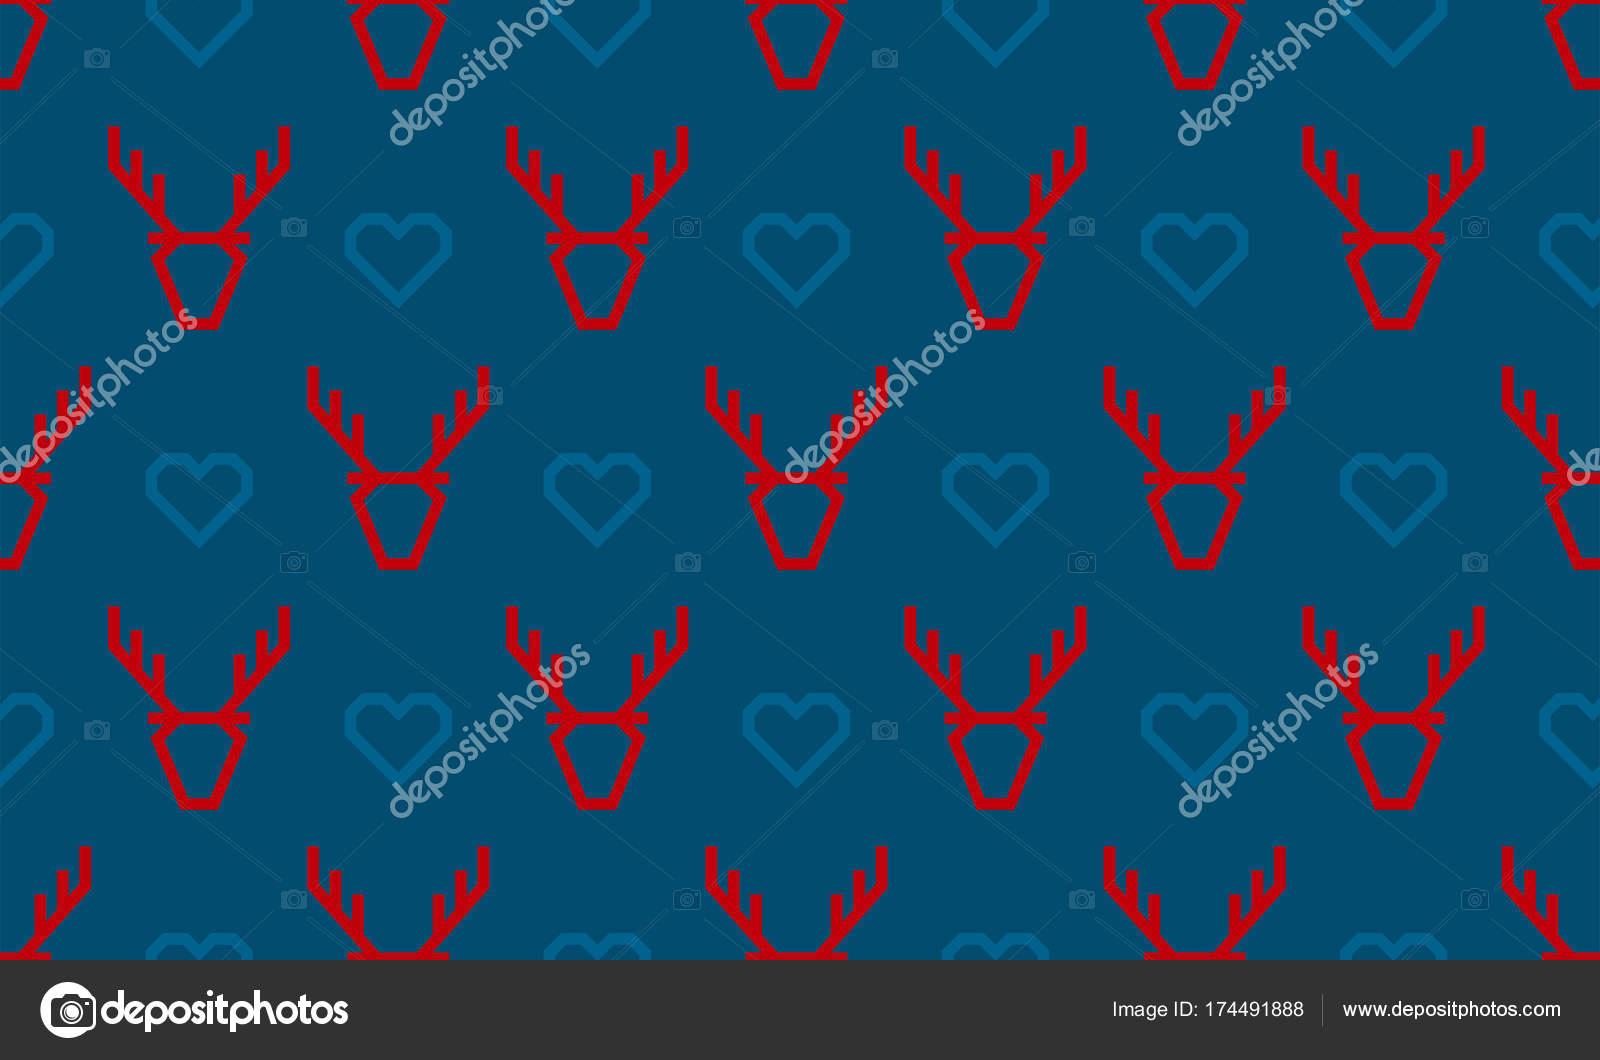 Christmas pattern background of seamless deer reindeer and heart